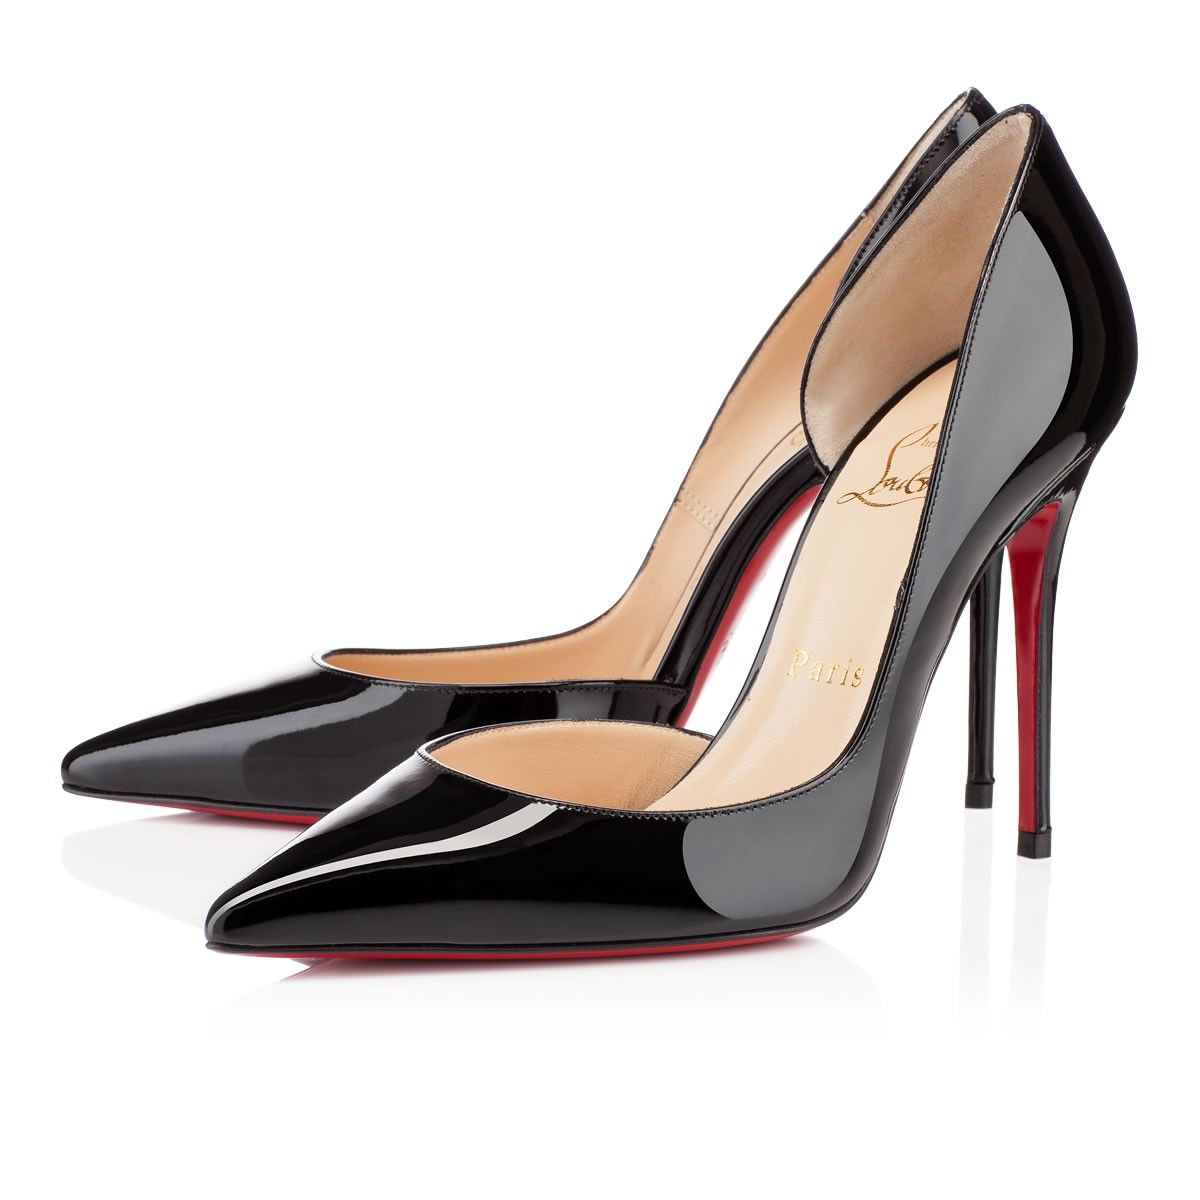 Iriza 100 Black Patent Leather - Women Shoes - Christian Louboutin